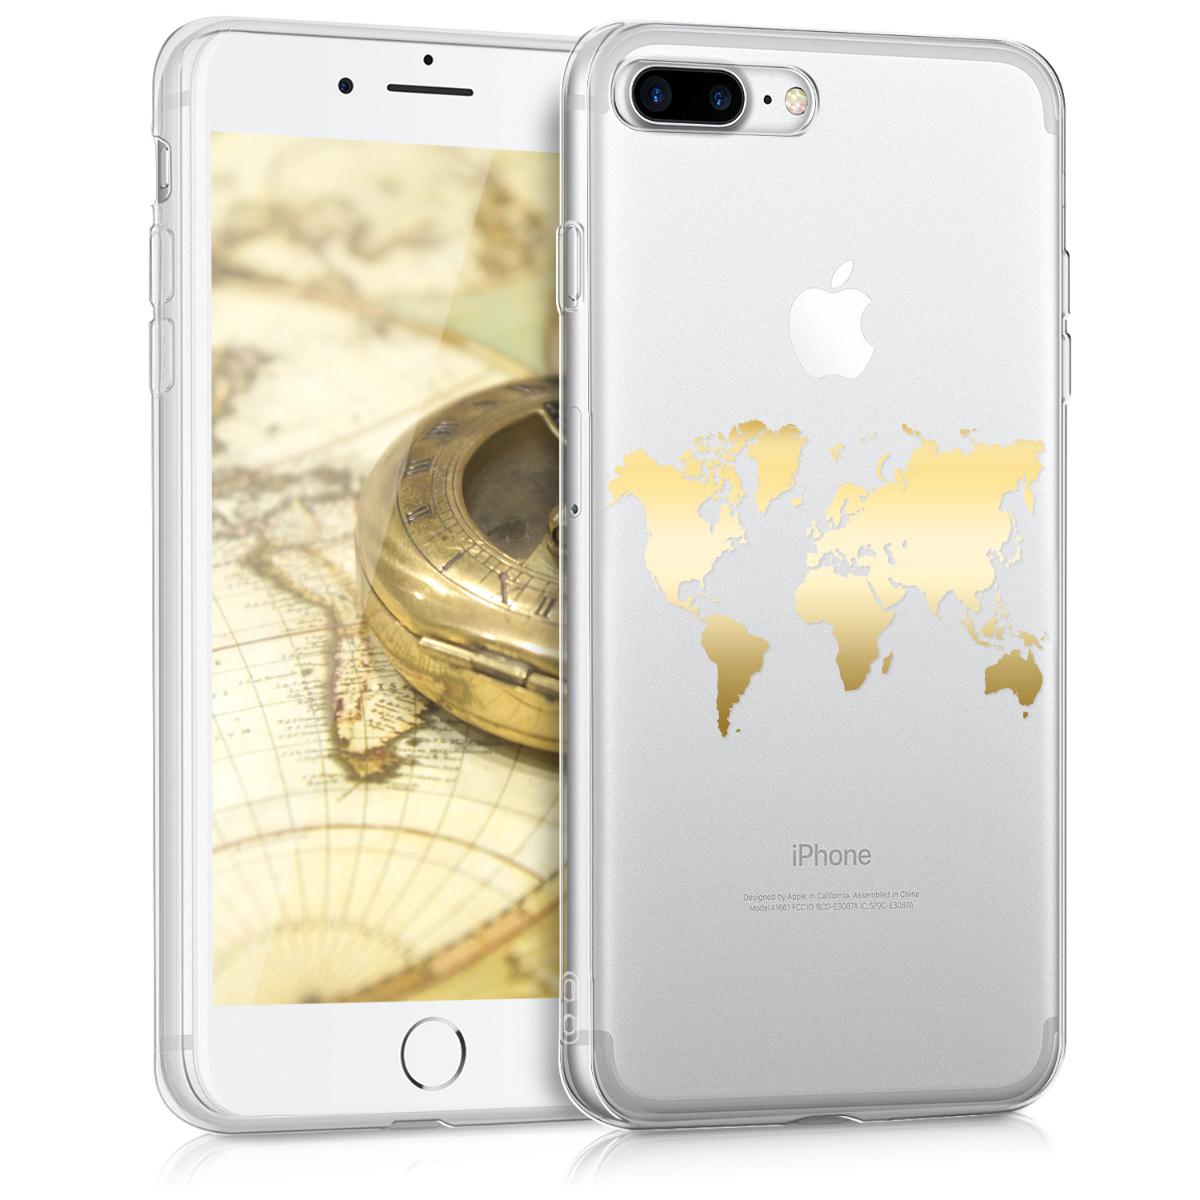 KW Θήκη Σιλικόνης iPhone 8 Plus / 7 Plus - Gold Map / Transparent (39500.04)